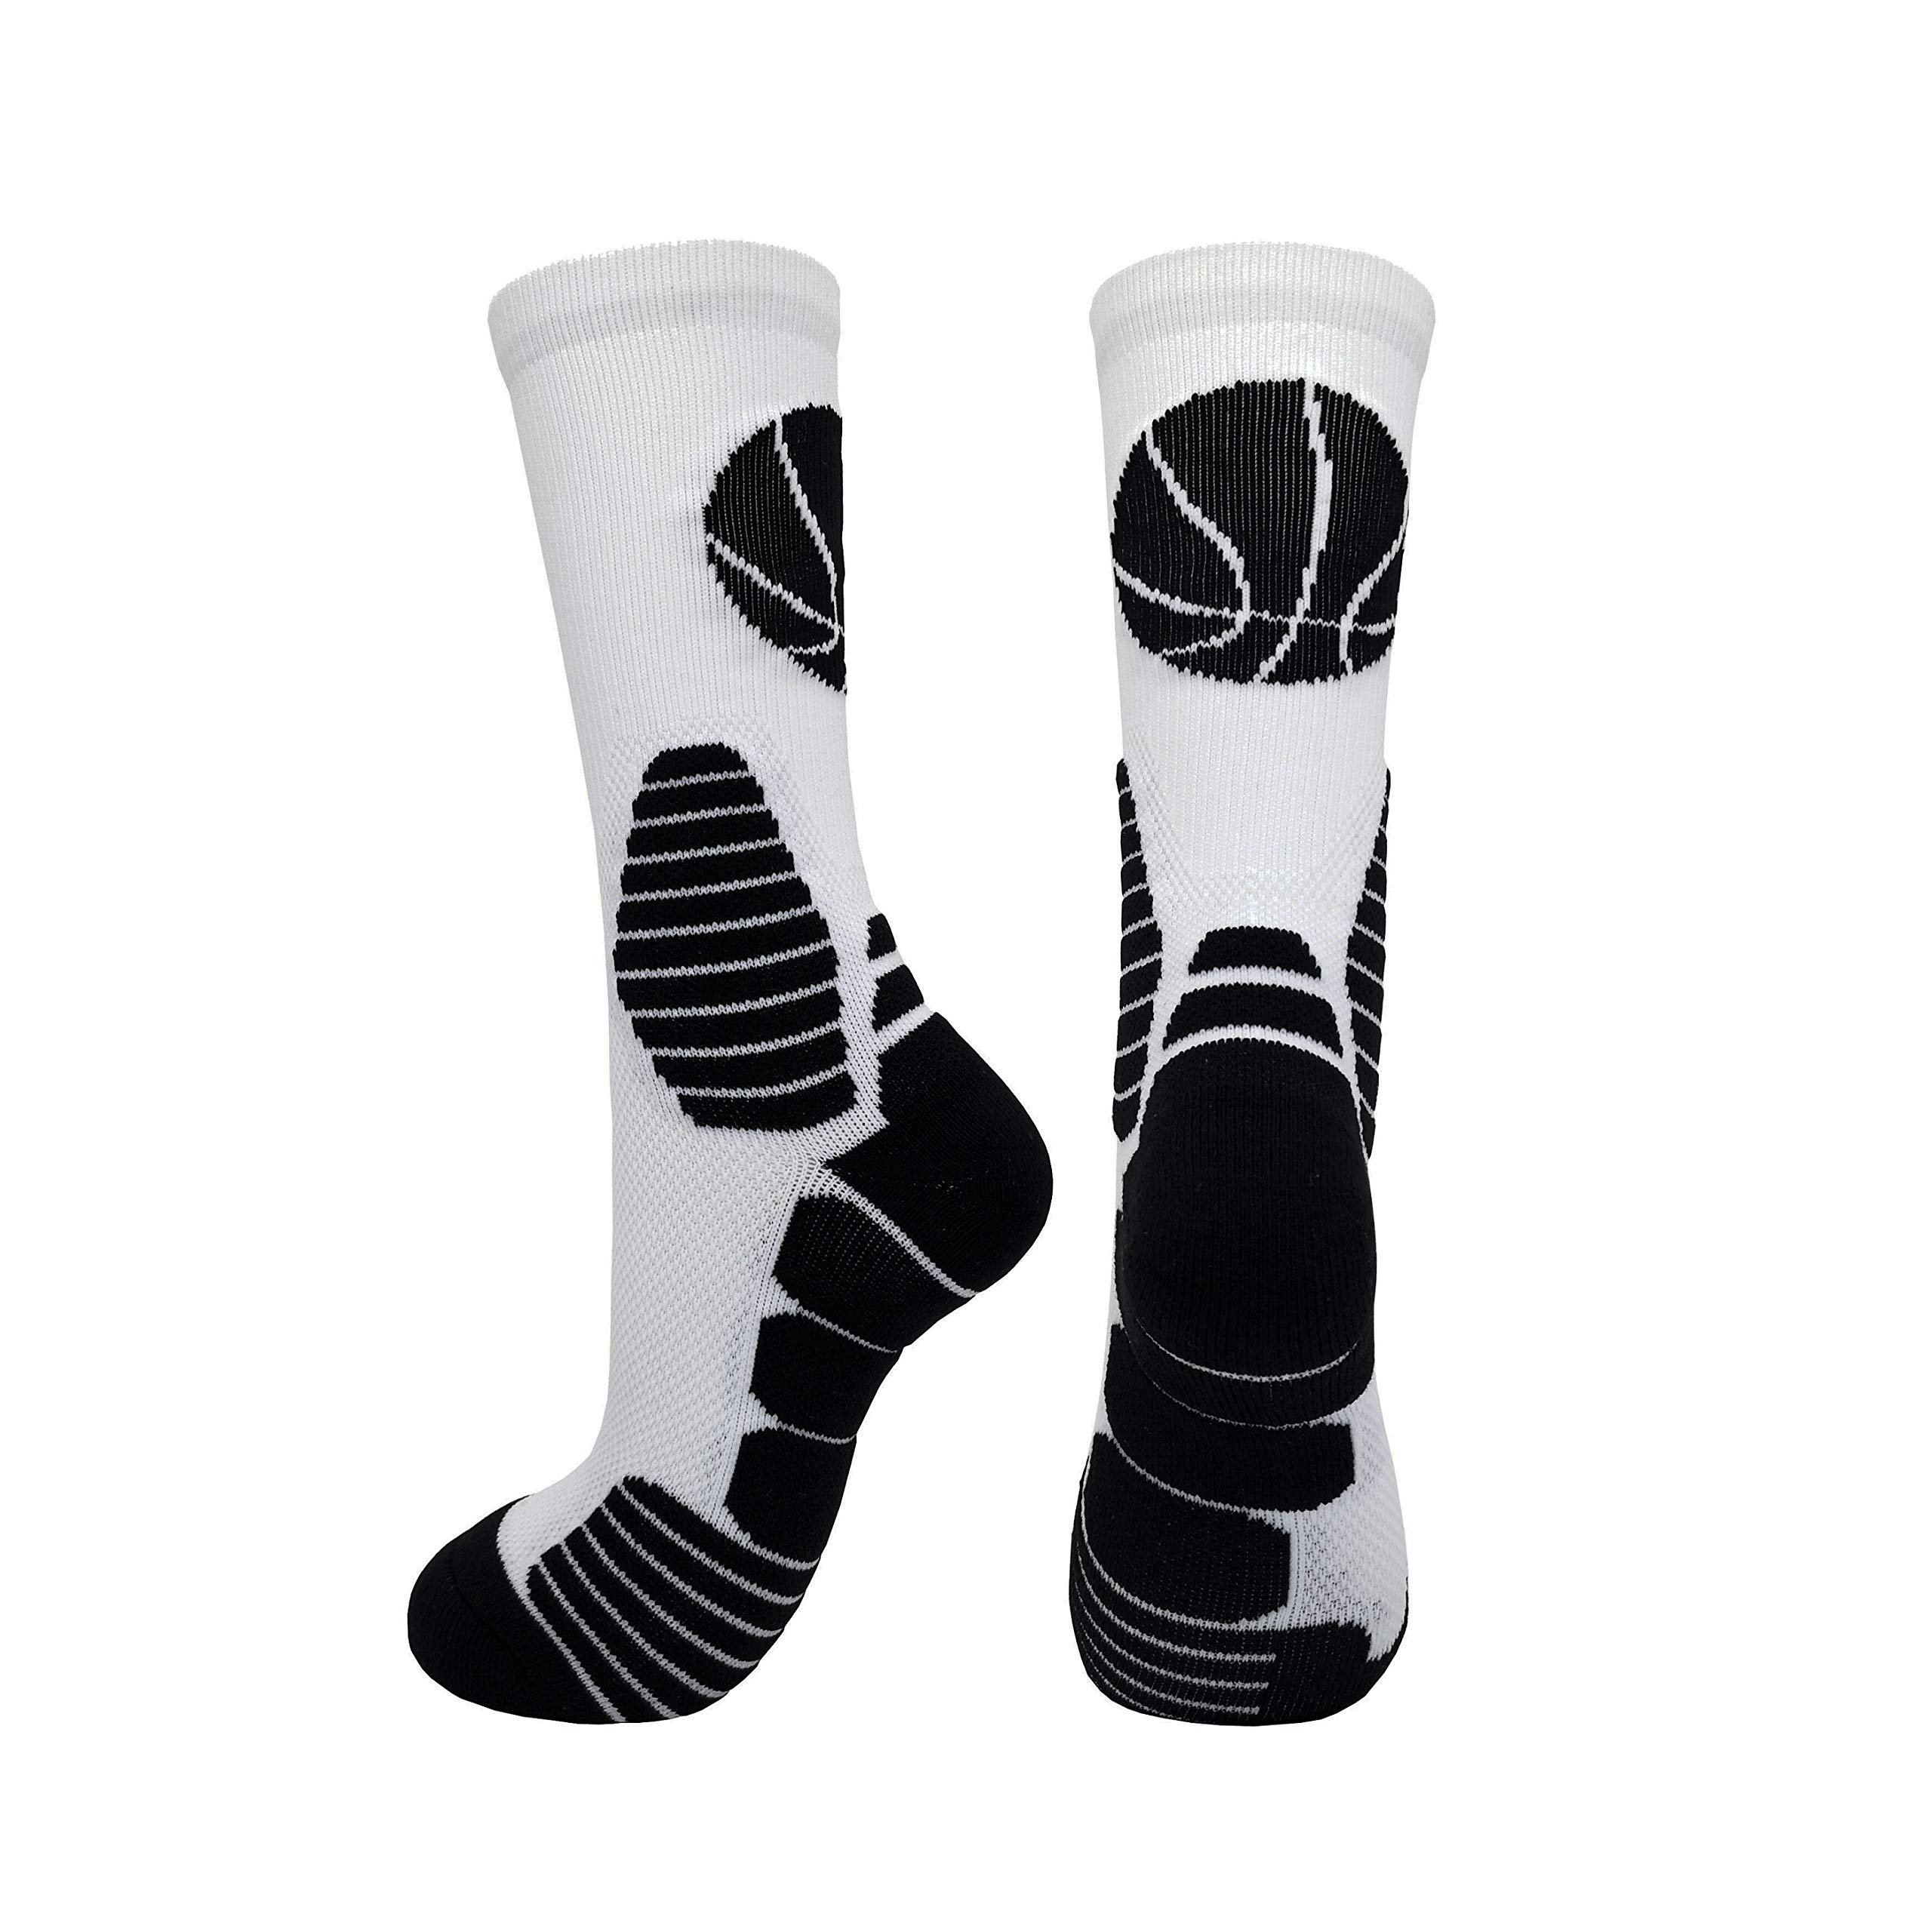 2 Pairs PK Elite Basketball Socks Dri-Fit Crew Sports Athletic Socks for Boy Girl Men Women (White/Black X 2PK, M) by HIGHCAMP